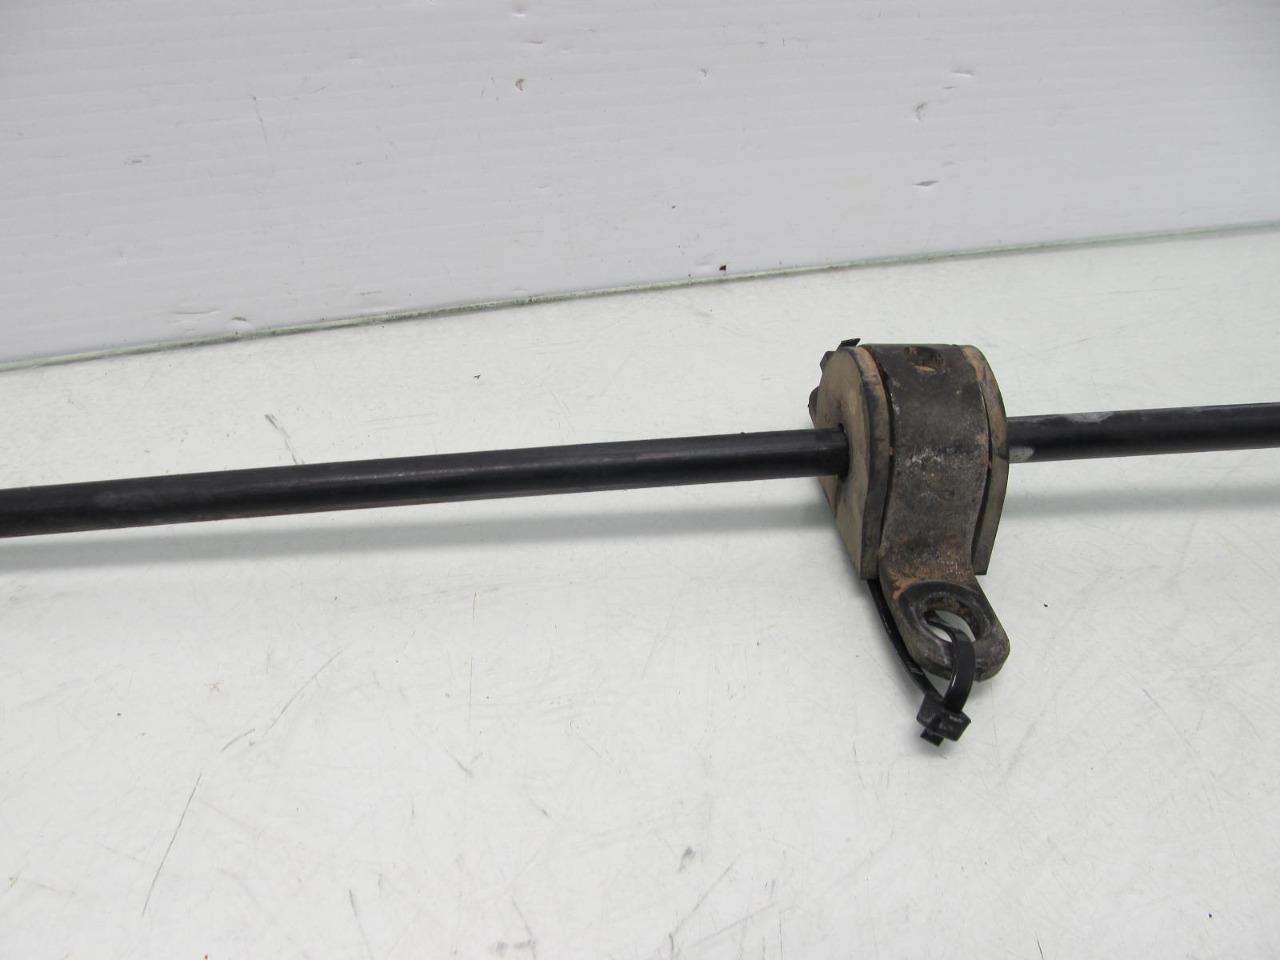 John Deere Adjust Sway Bars : John deere gator rsx i rear swaybar